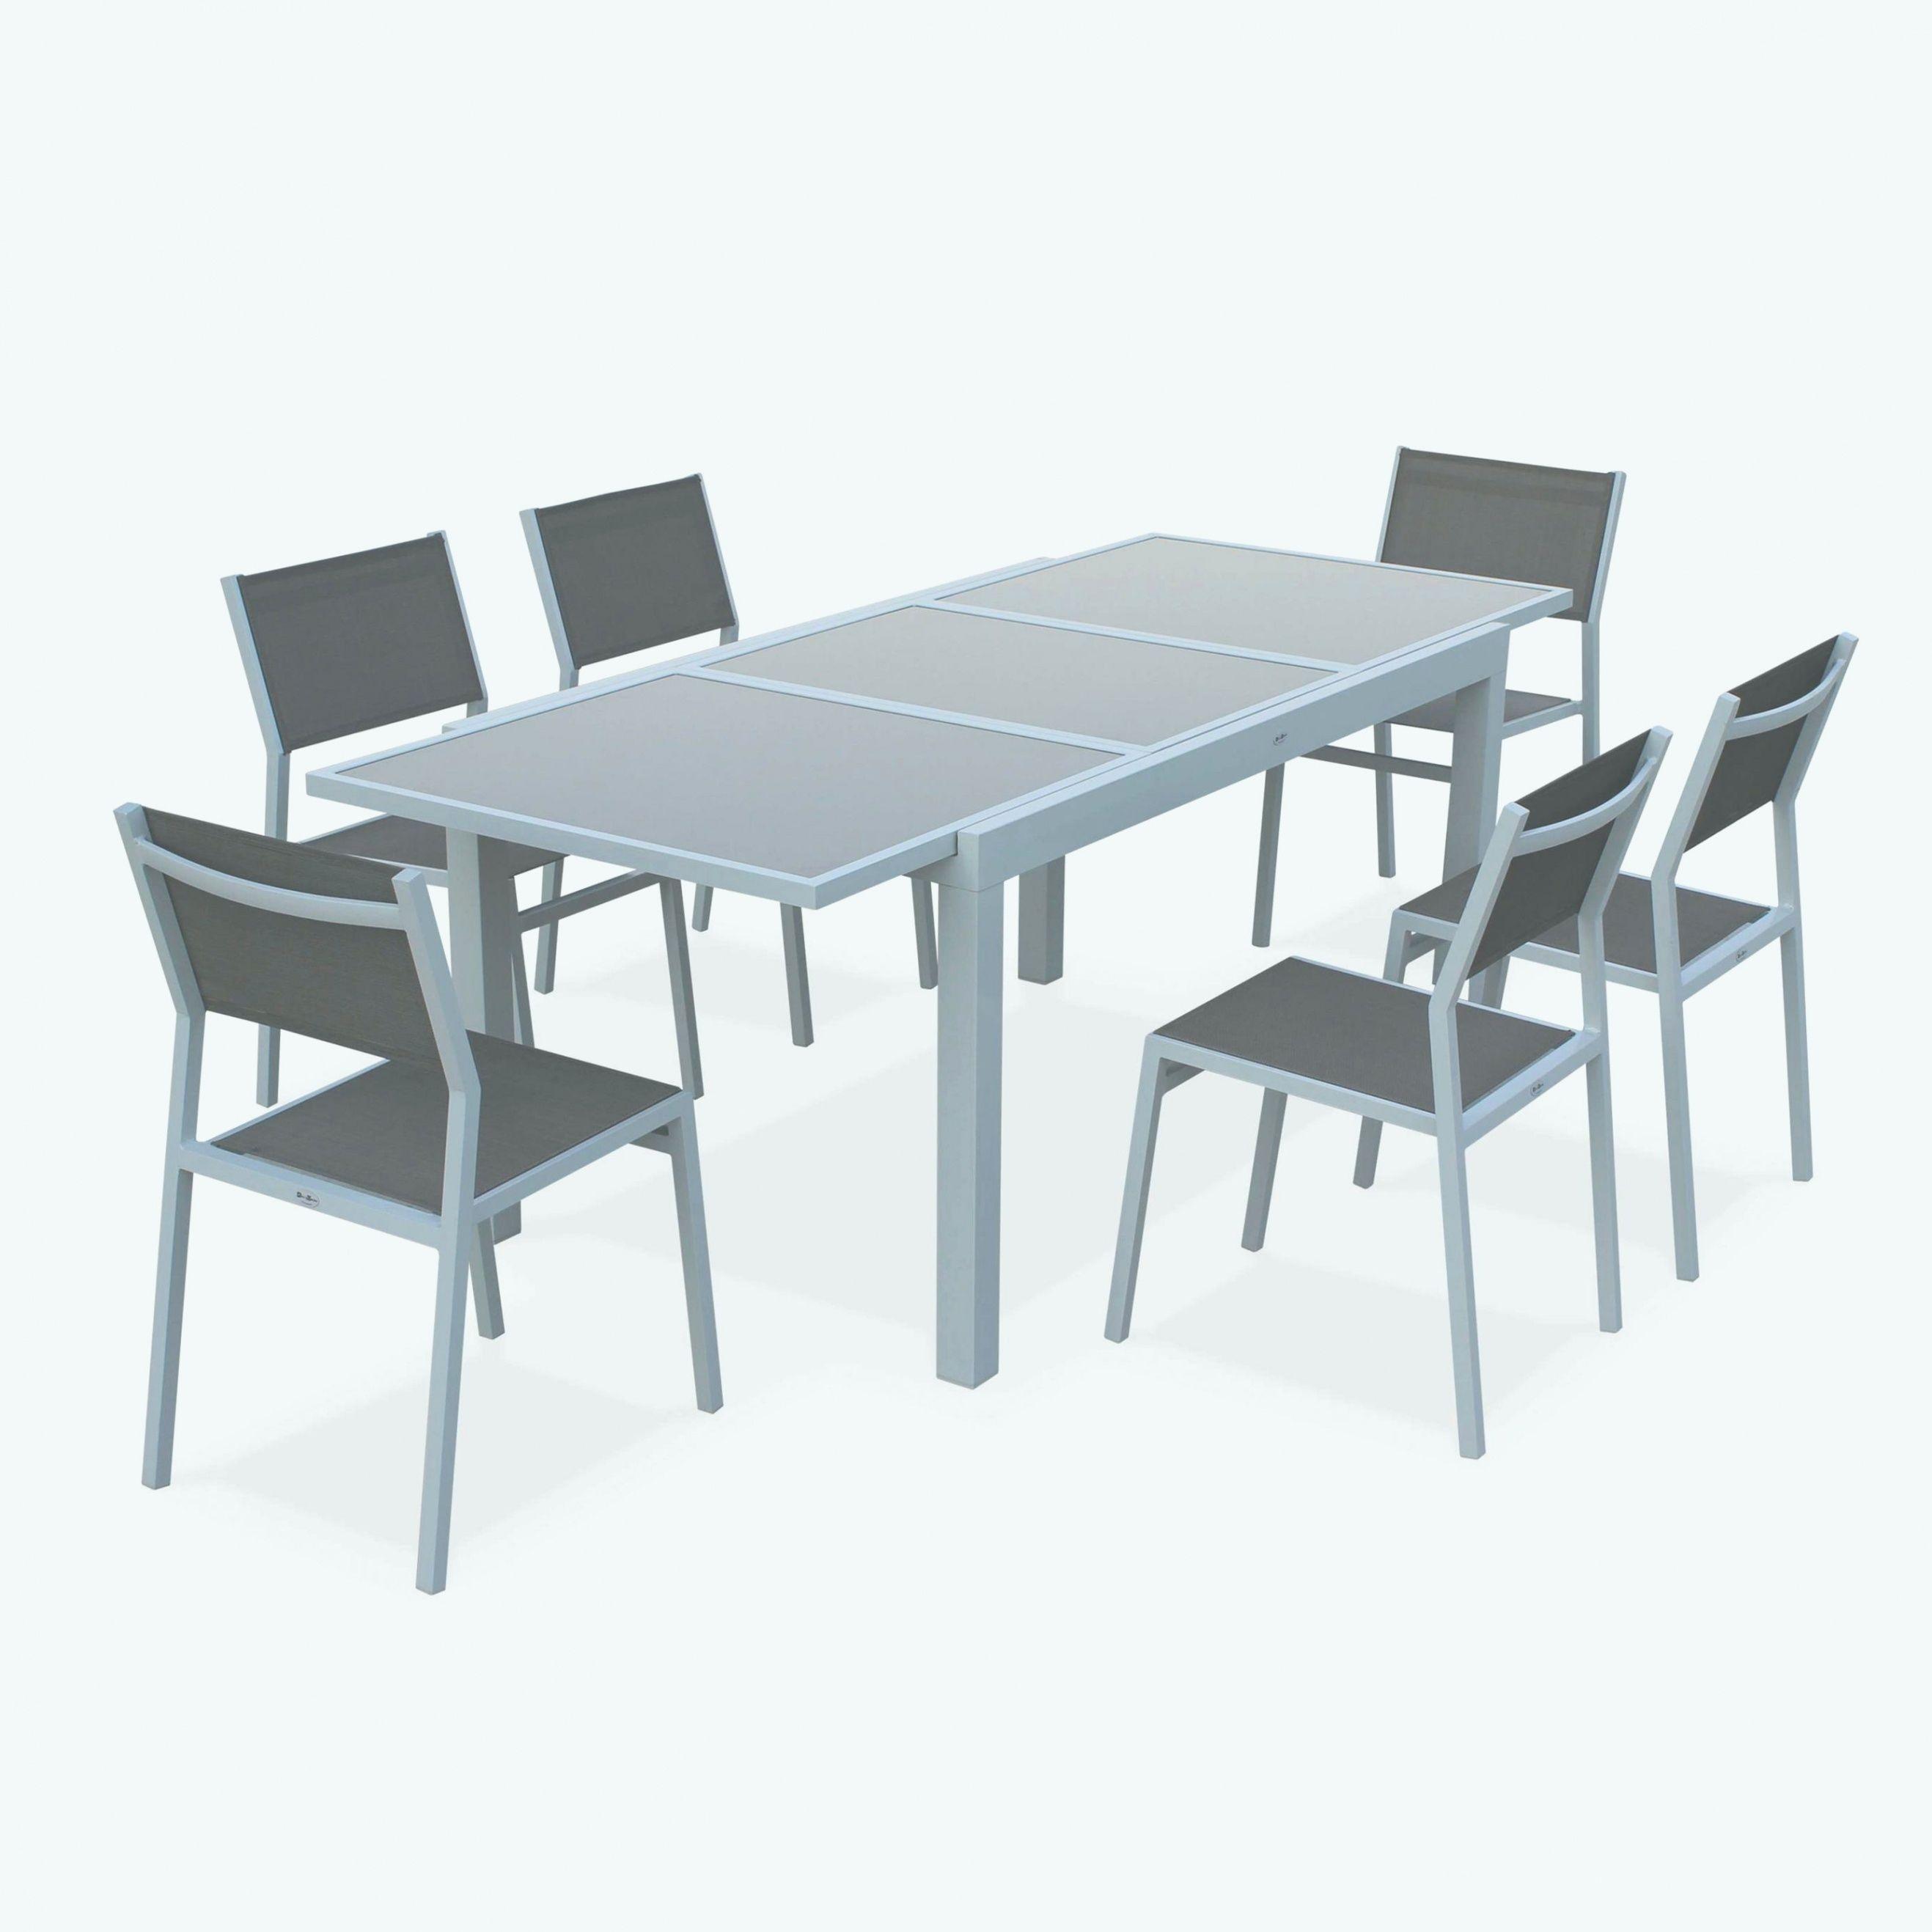 77 Salon De Jardin En Aluminium dedans Table De Jardin En Aluminium